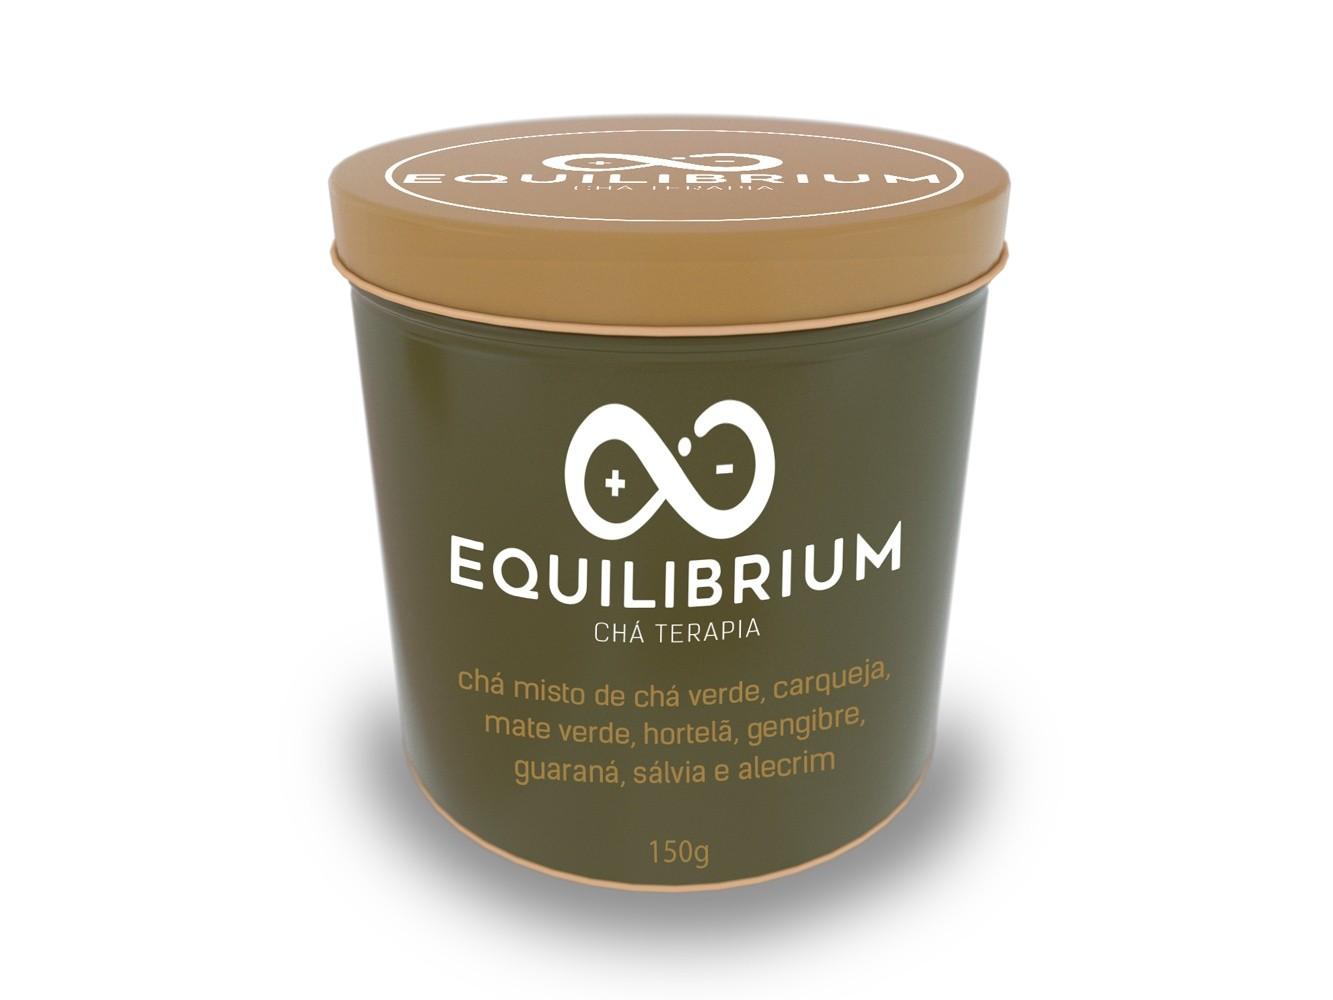 Equilibrium Chá Terapia